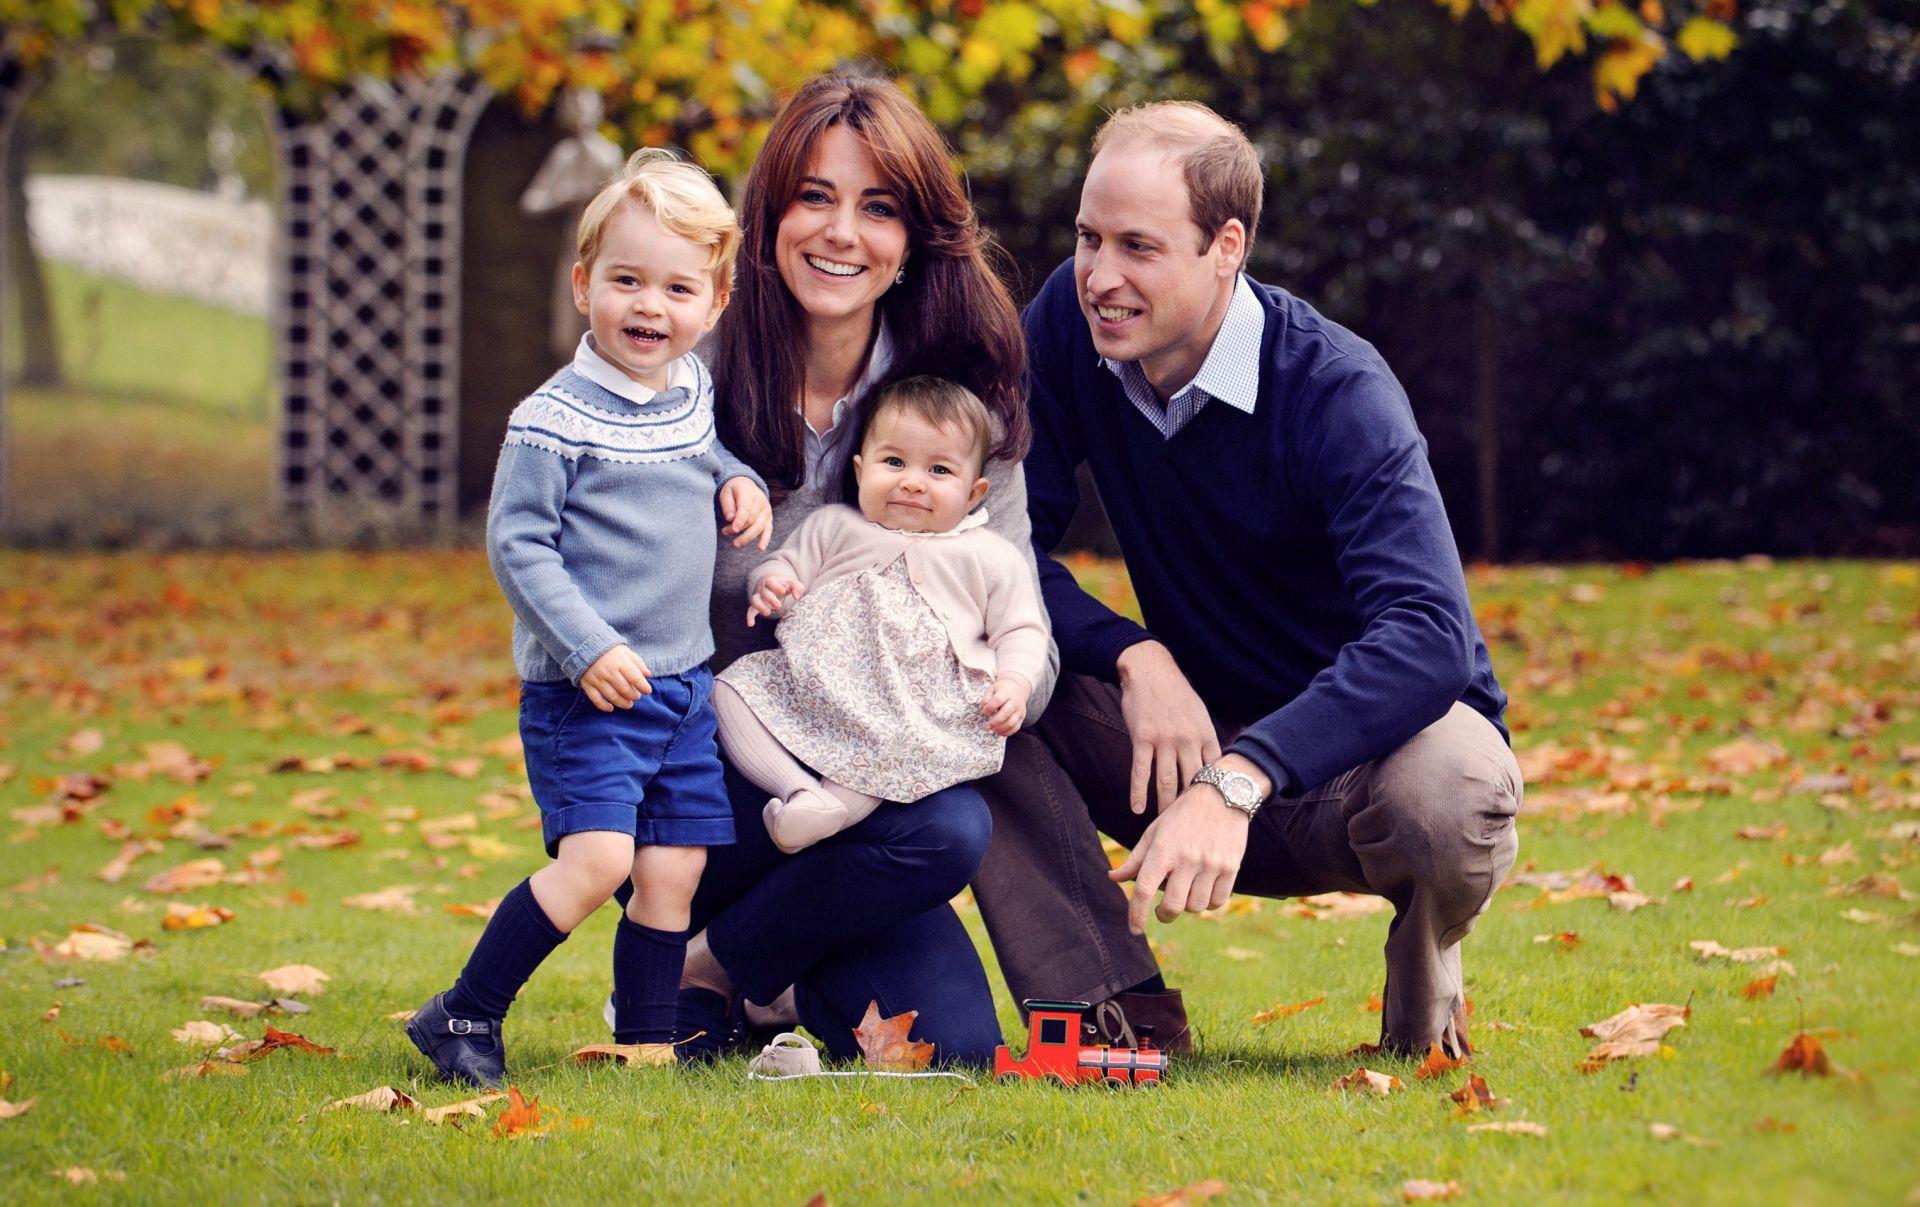 OBITELJSKI PORTRET Kensingtonska palača objavila fotografiju sretne četveročlane obitelji